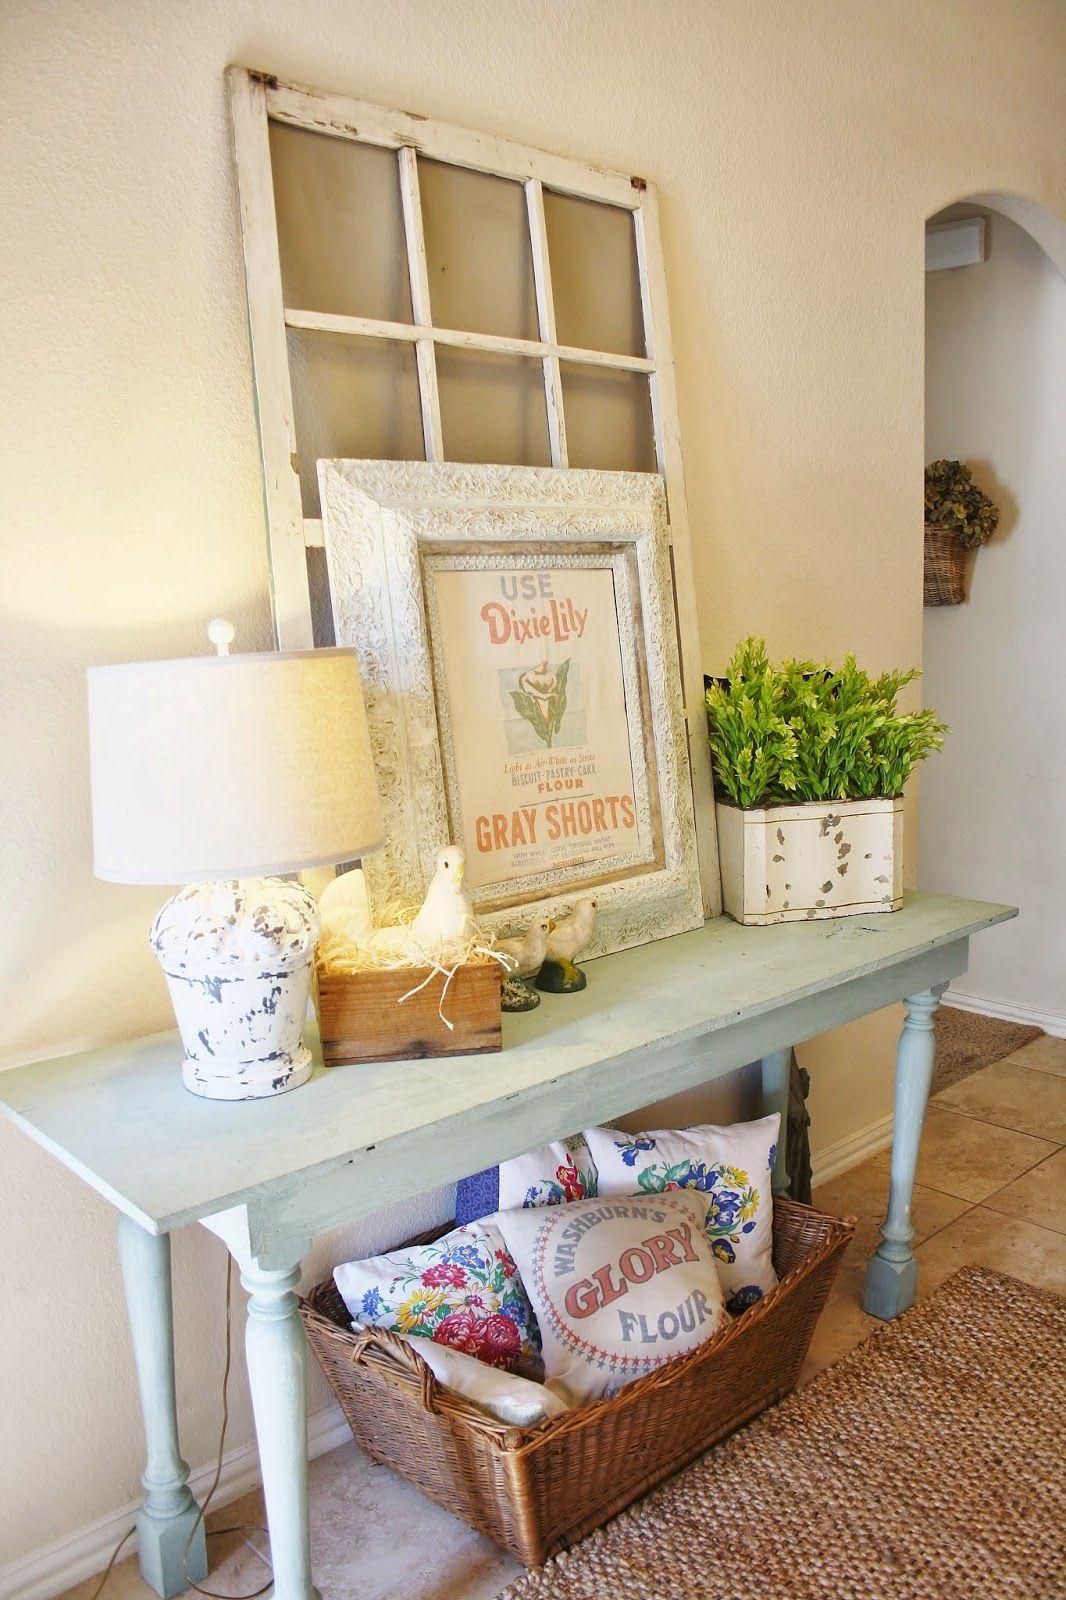 The Farmhouse Porch: Spring Entry Way | farmstyle | Pinterest ...